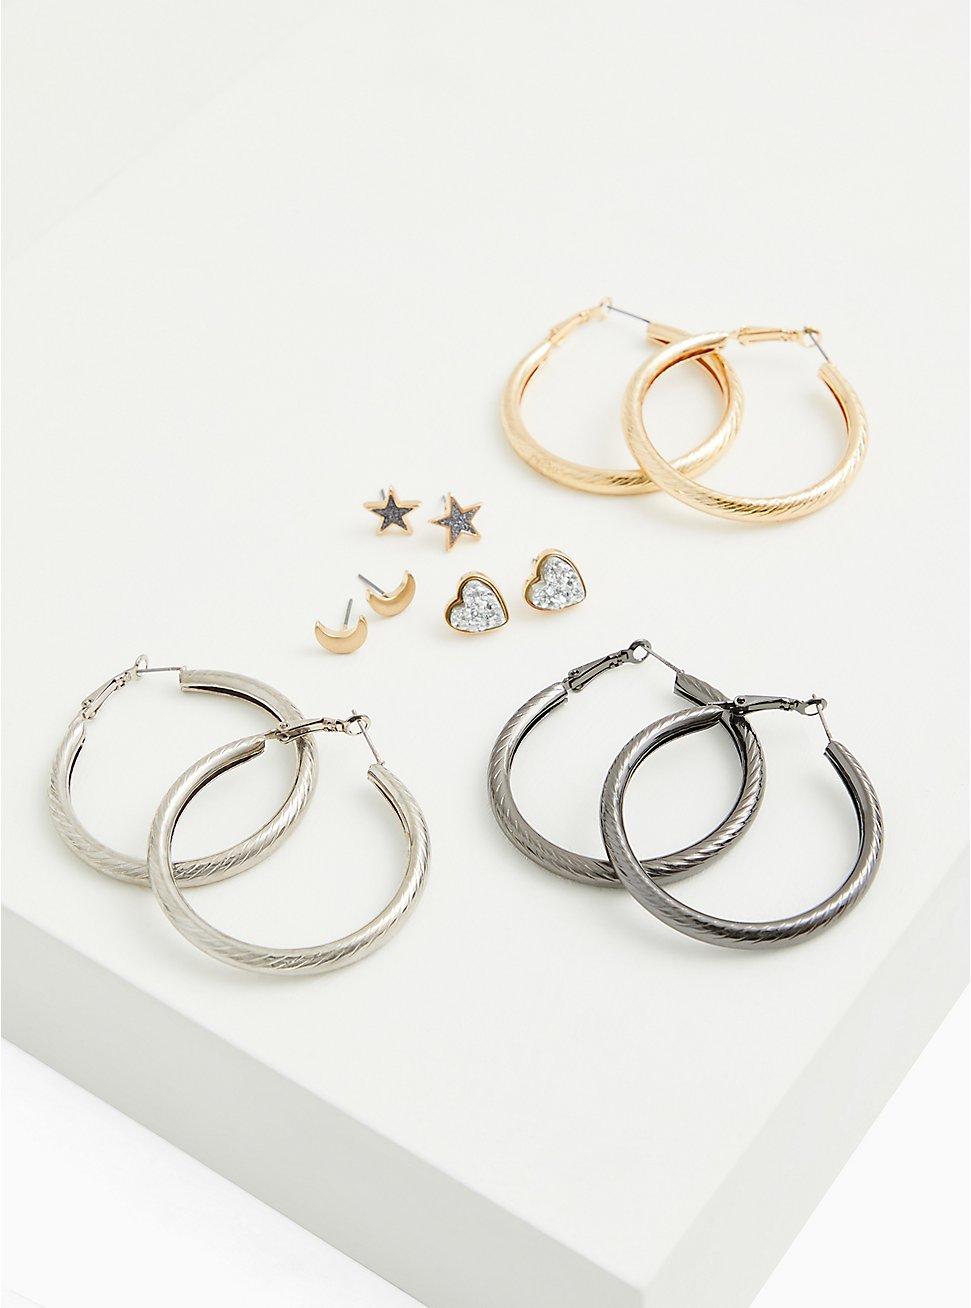 Silver and Gold-Tone Stud & Hoop Earrings Set - Set Of 6, , hi-res